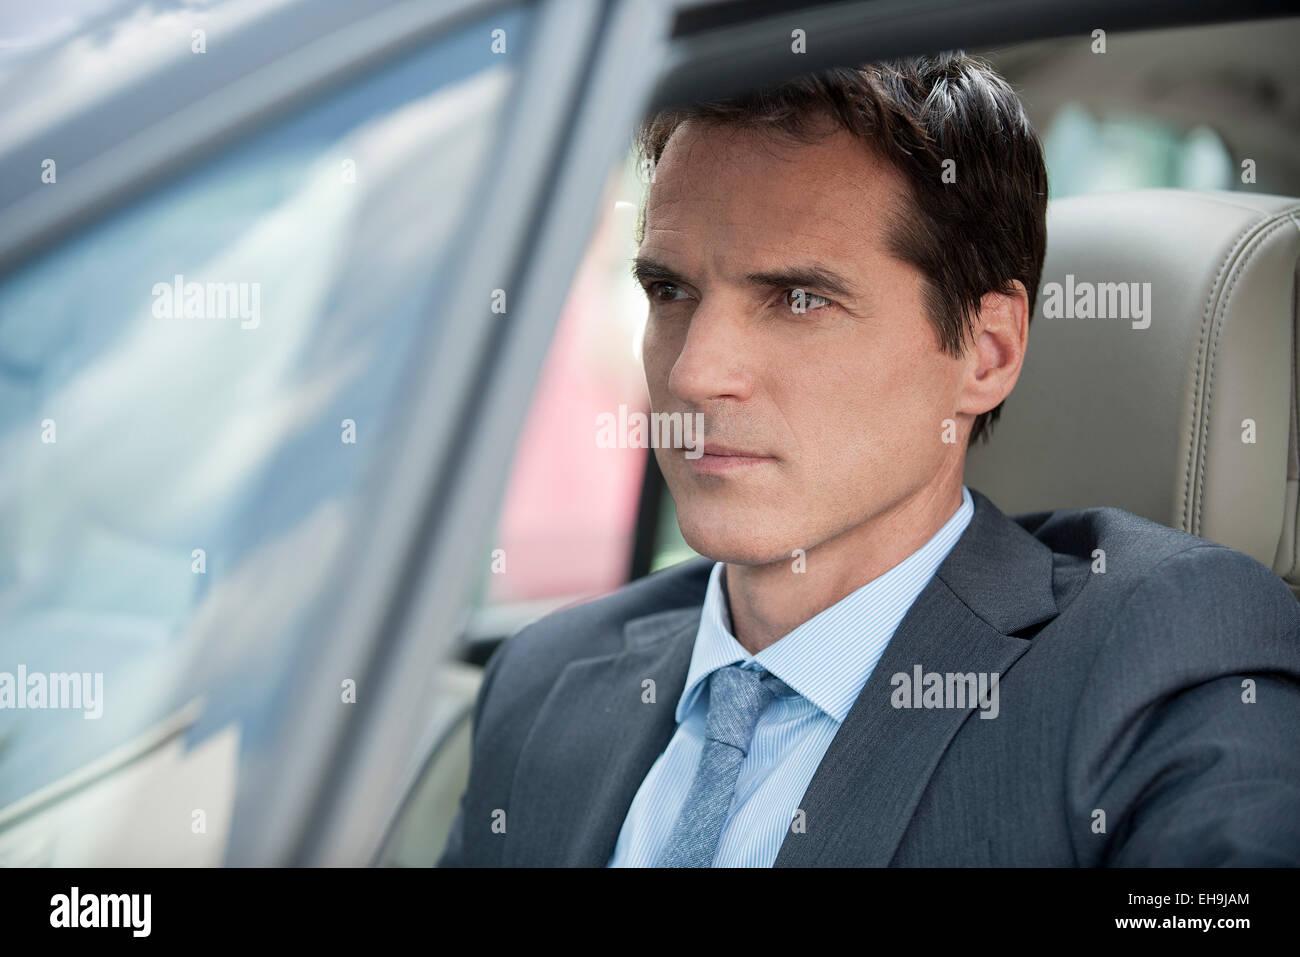 Businessman stuck in traffic - Stock Image